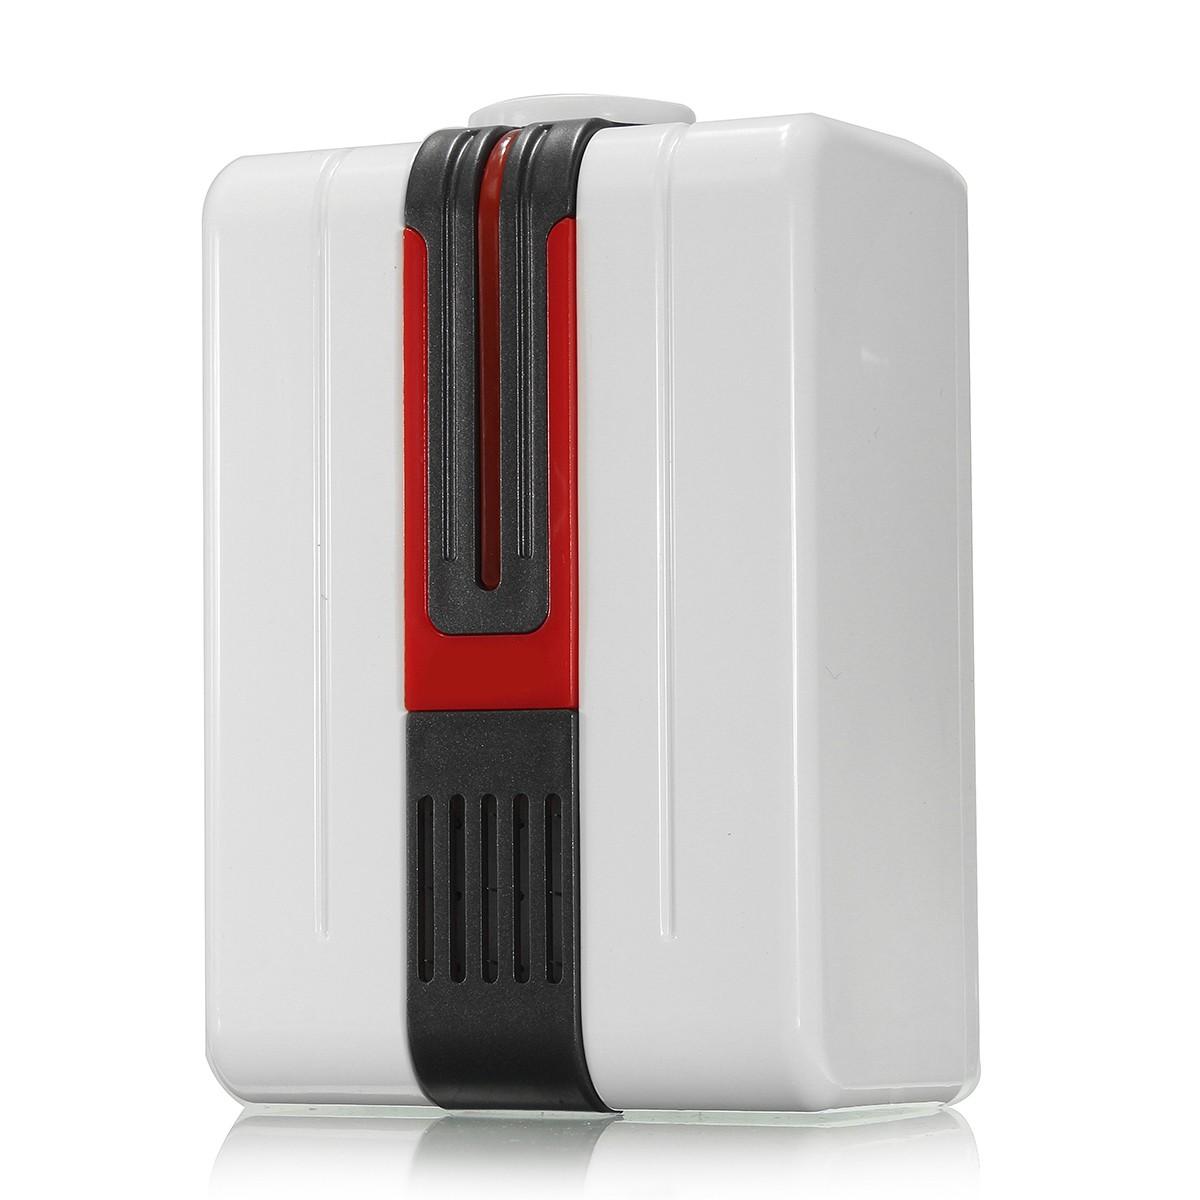 Air Purifier Ozone Ionizer Cleaner : Led air purifier ozone ionizer cleaner fresh clean living